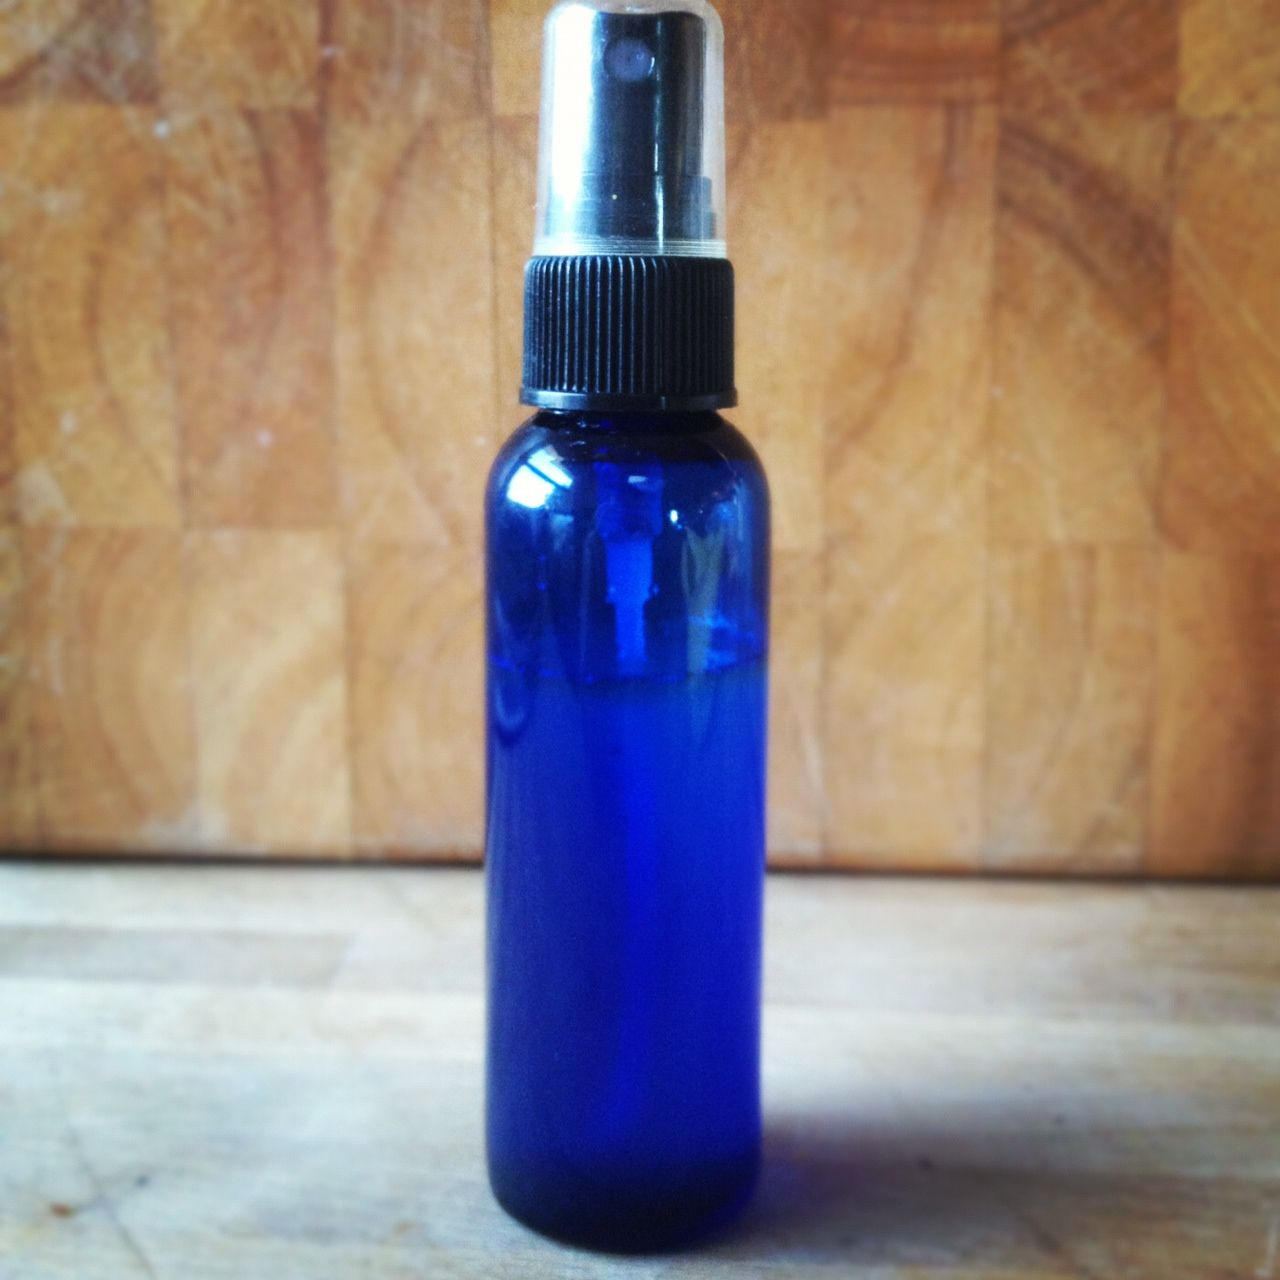 Allnatural homemade hand sanitizer recipe! Cheap and